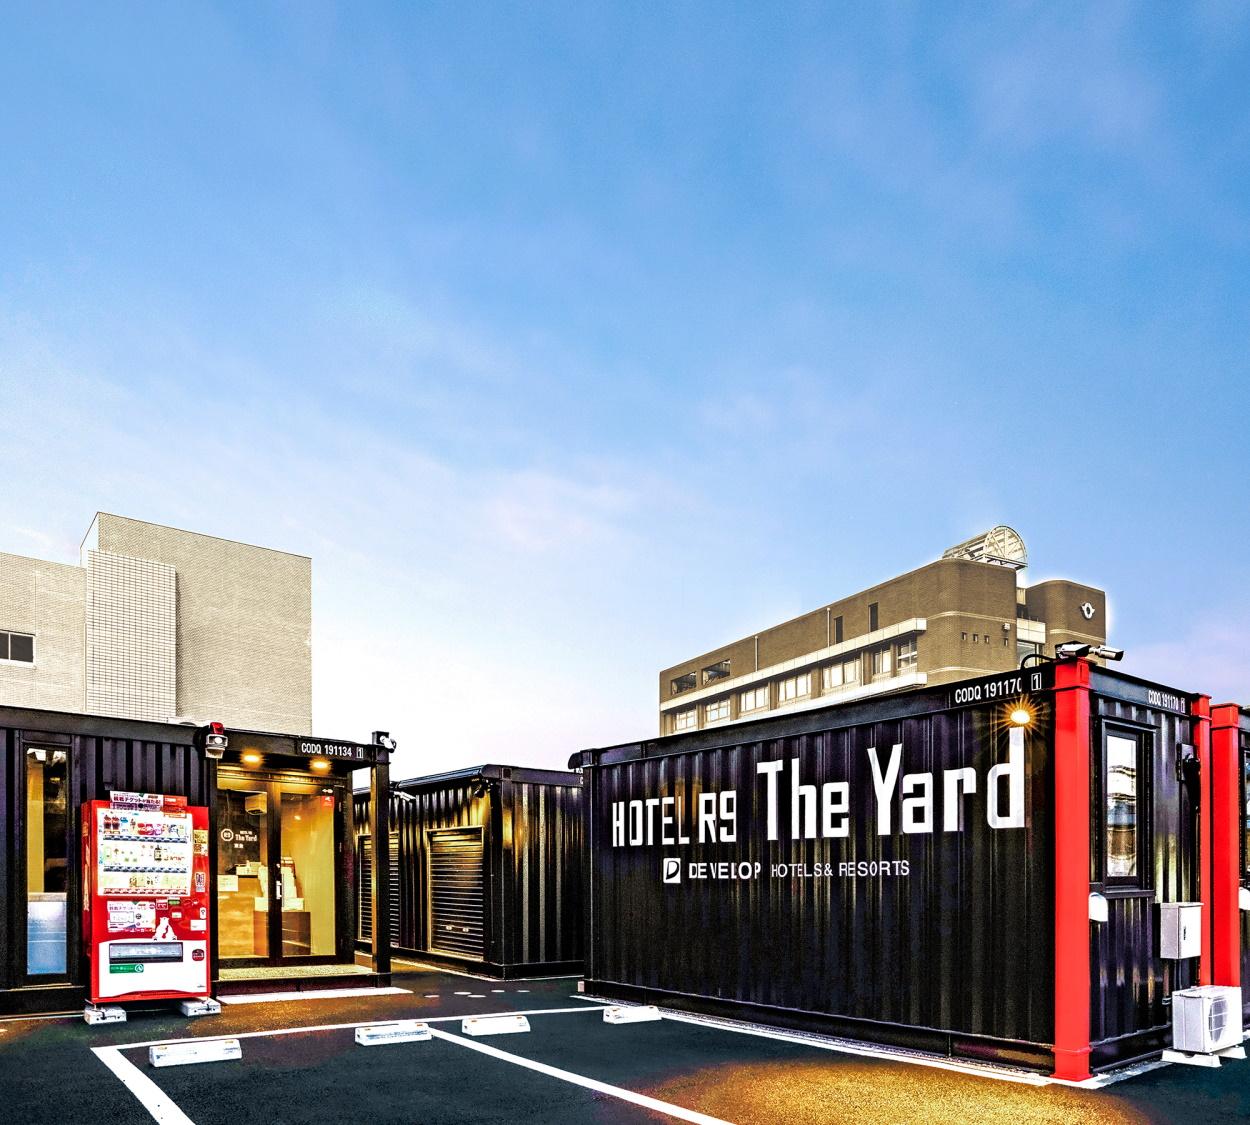 HOTEL R9 The Yard 東金